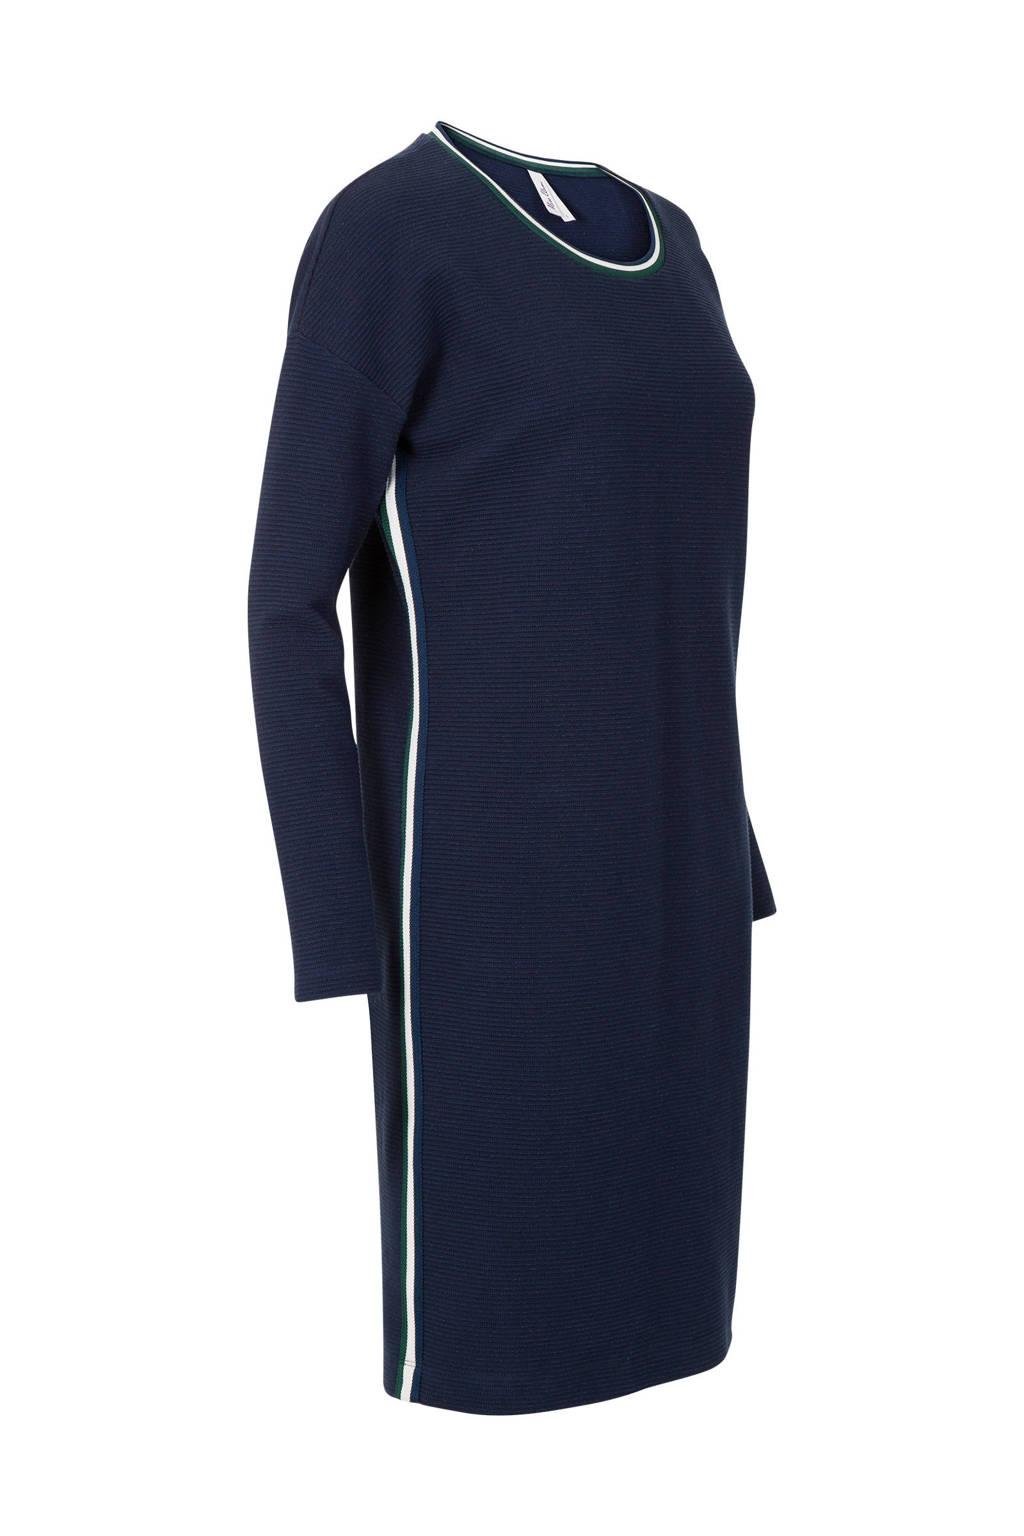 Miss Etam Regulier jurk met bies blauw, Donkerblauw